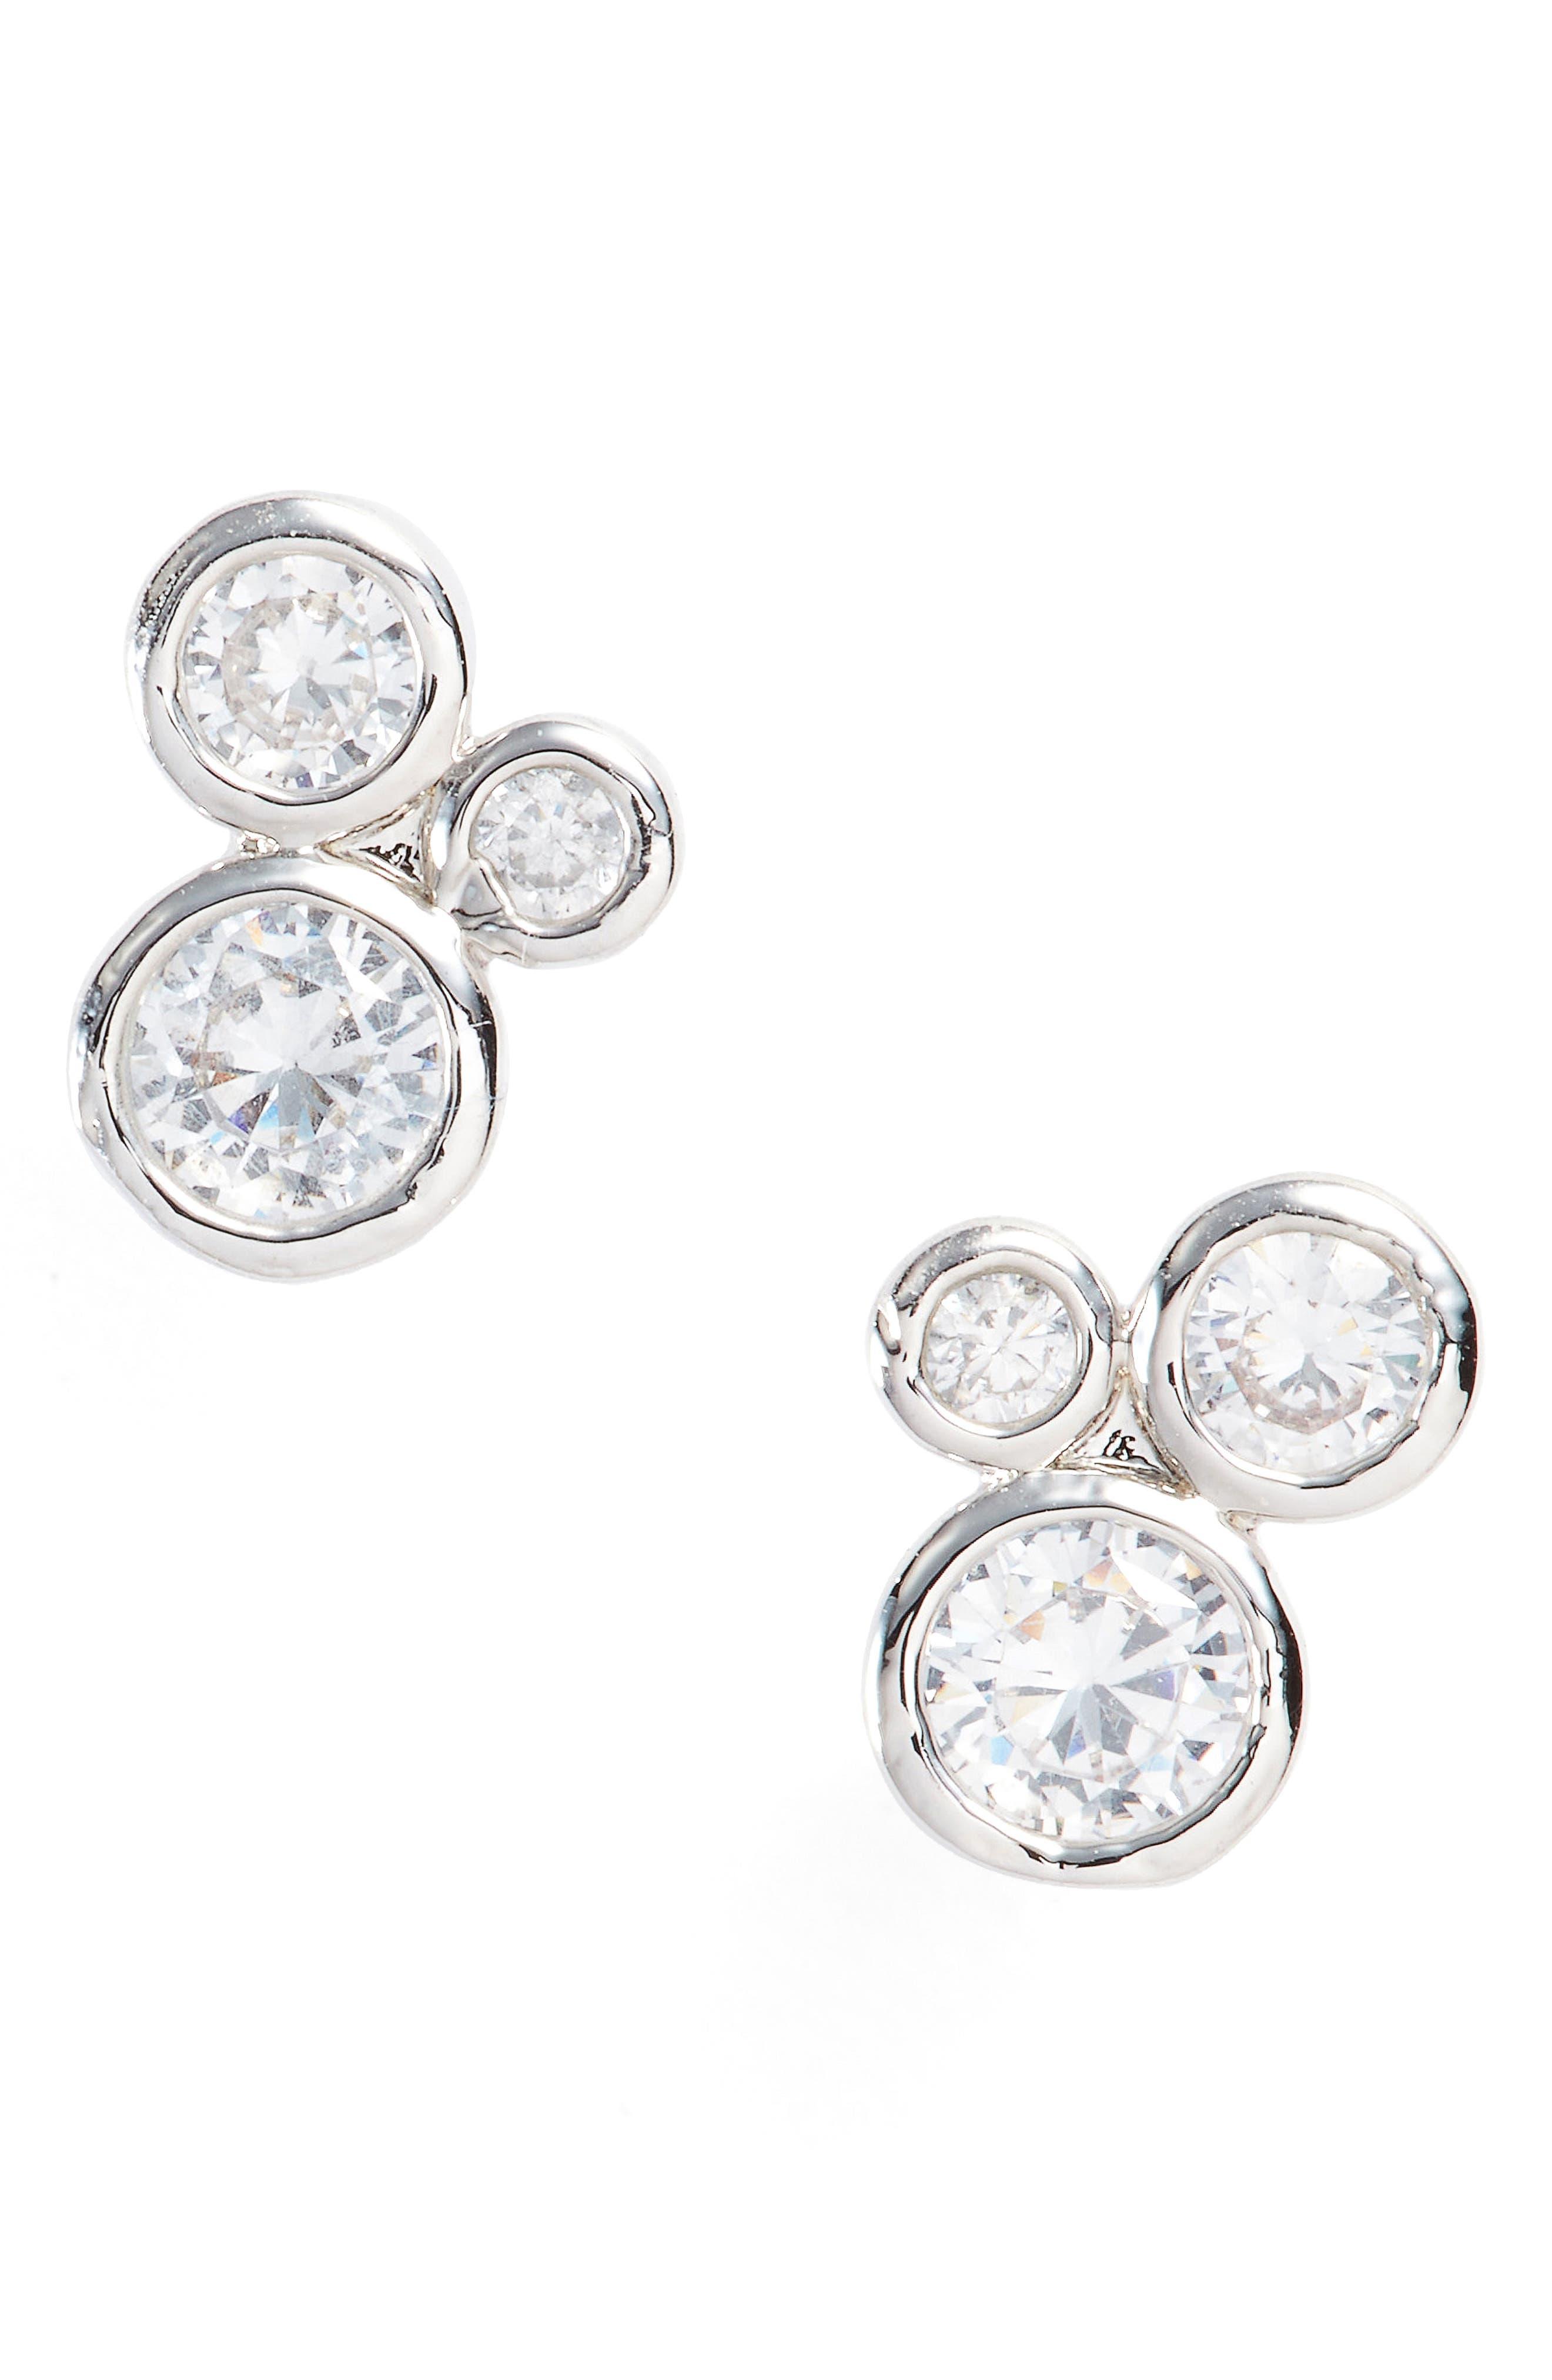 Jasmine Stud Earrings,                             Main thumbnail 1, color,                             040